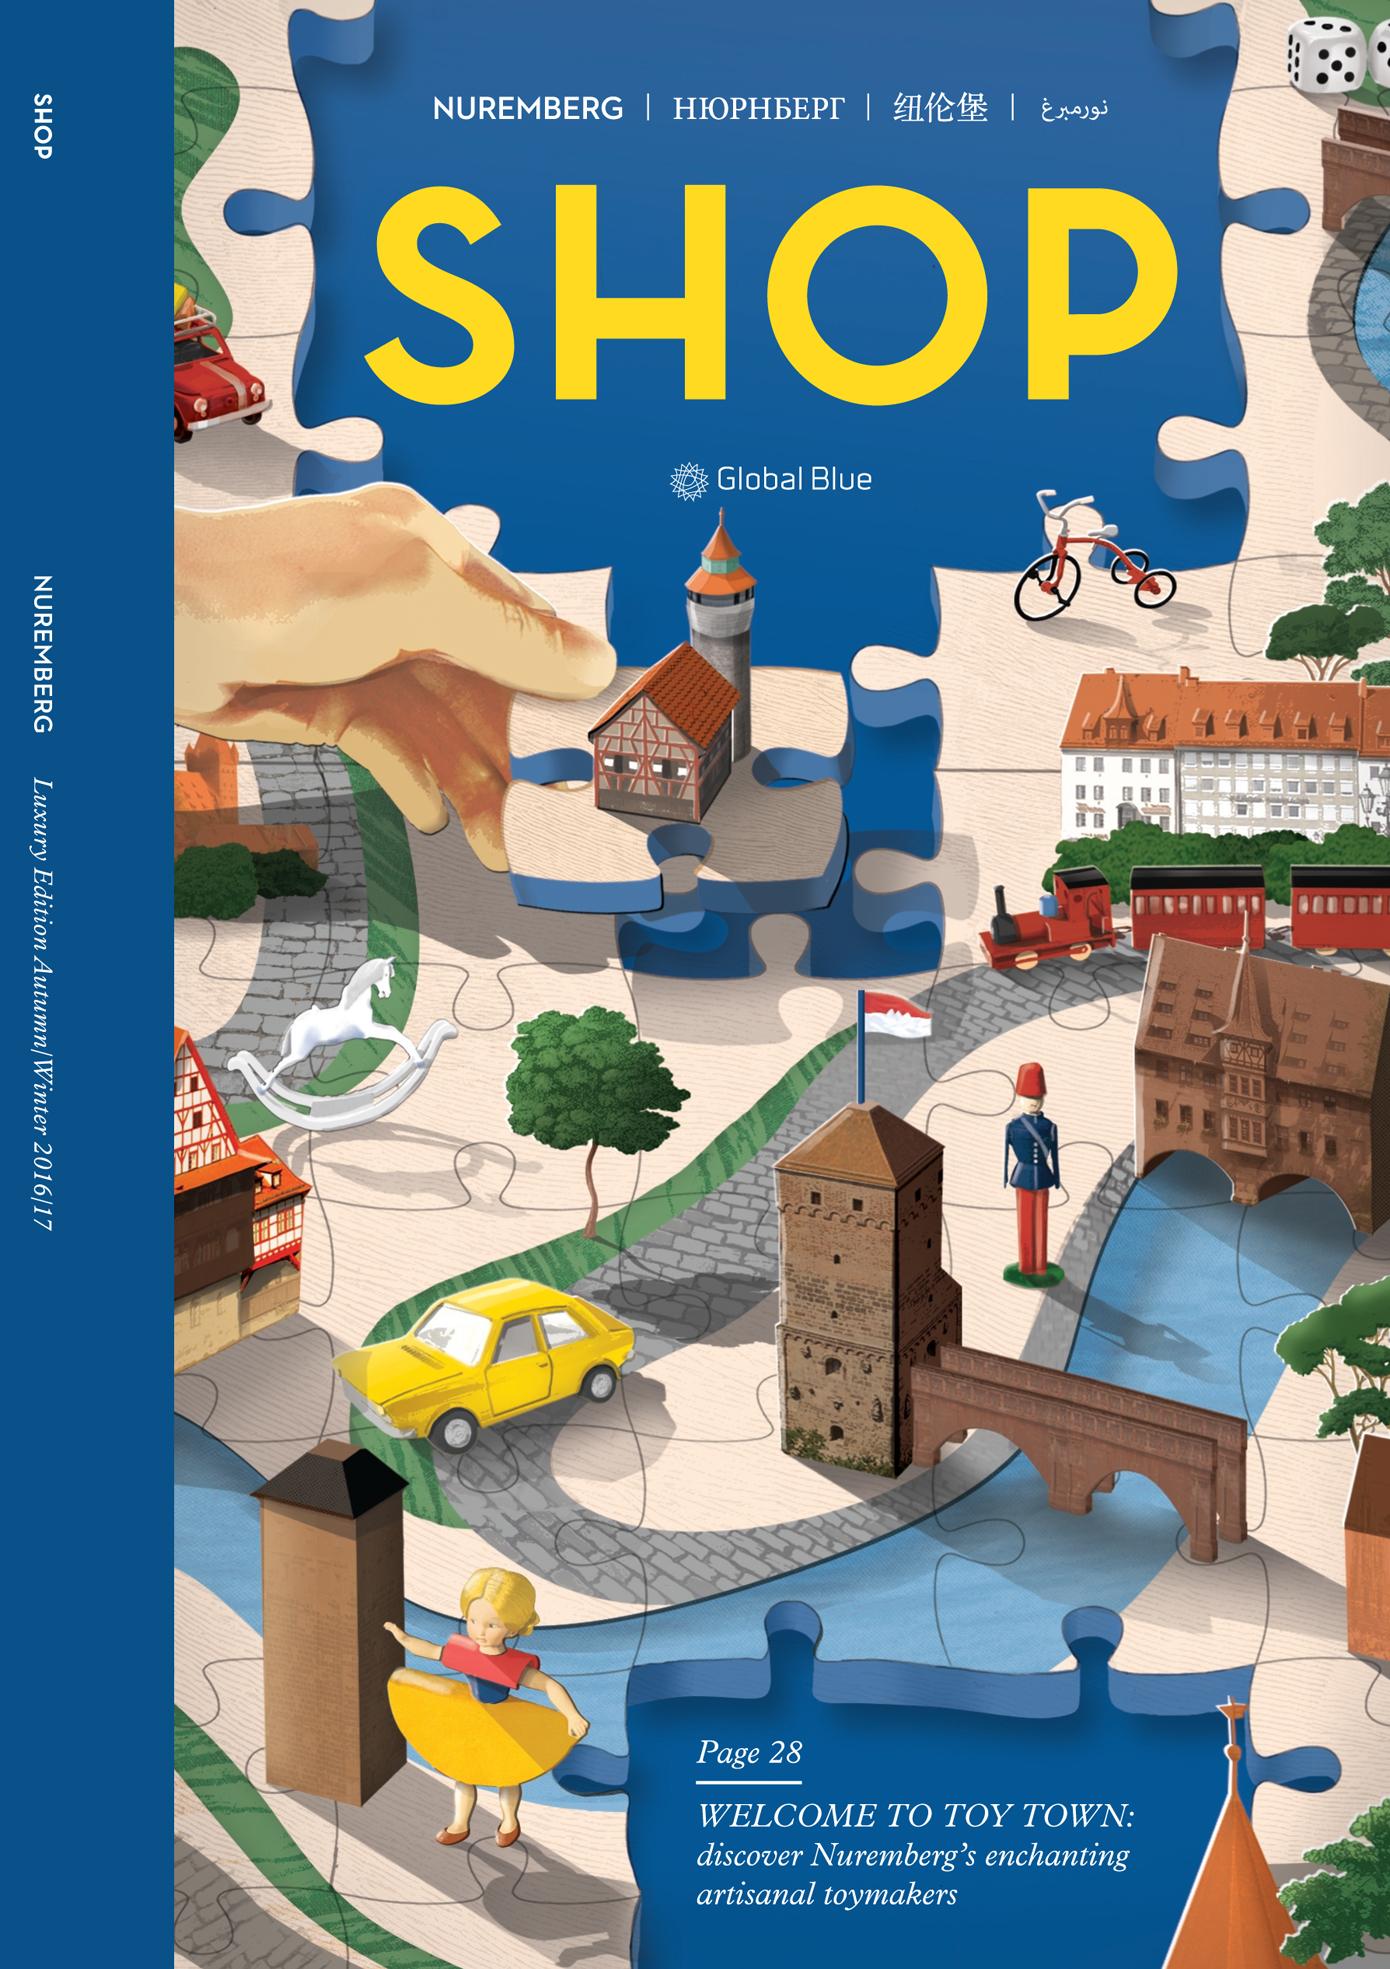 NUREMBERG SHOP COVER AW16[1].jpg